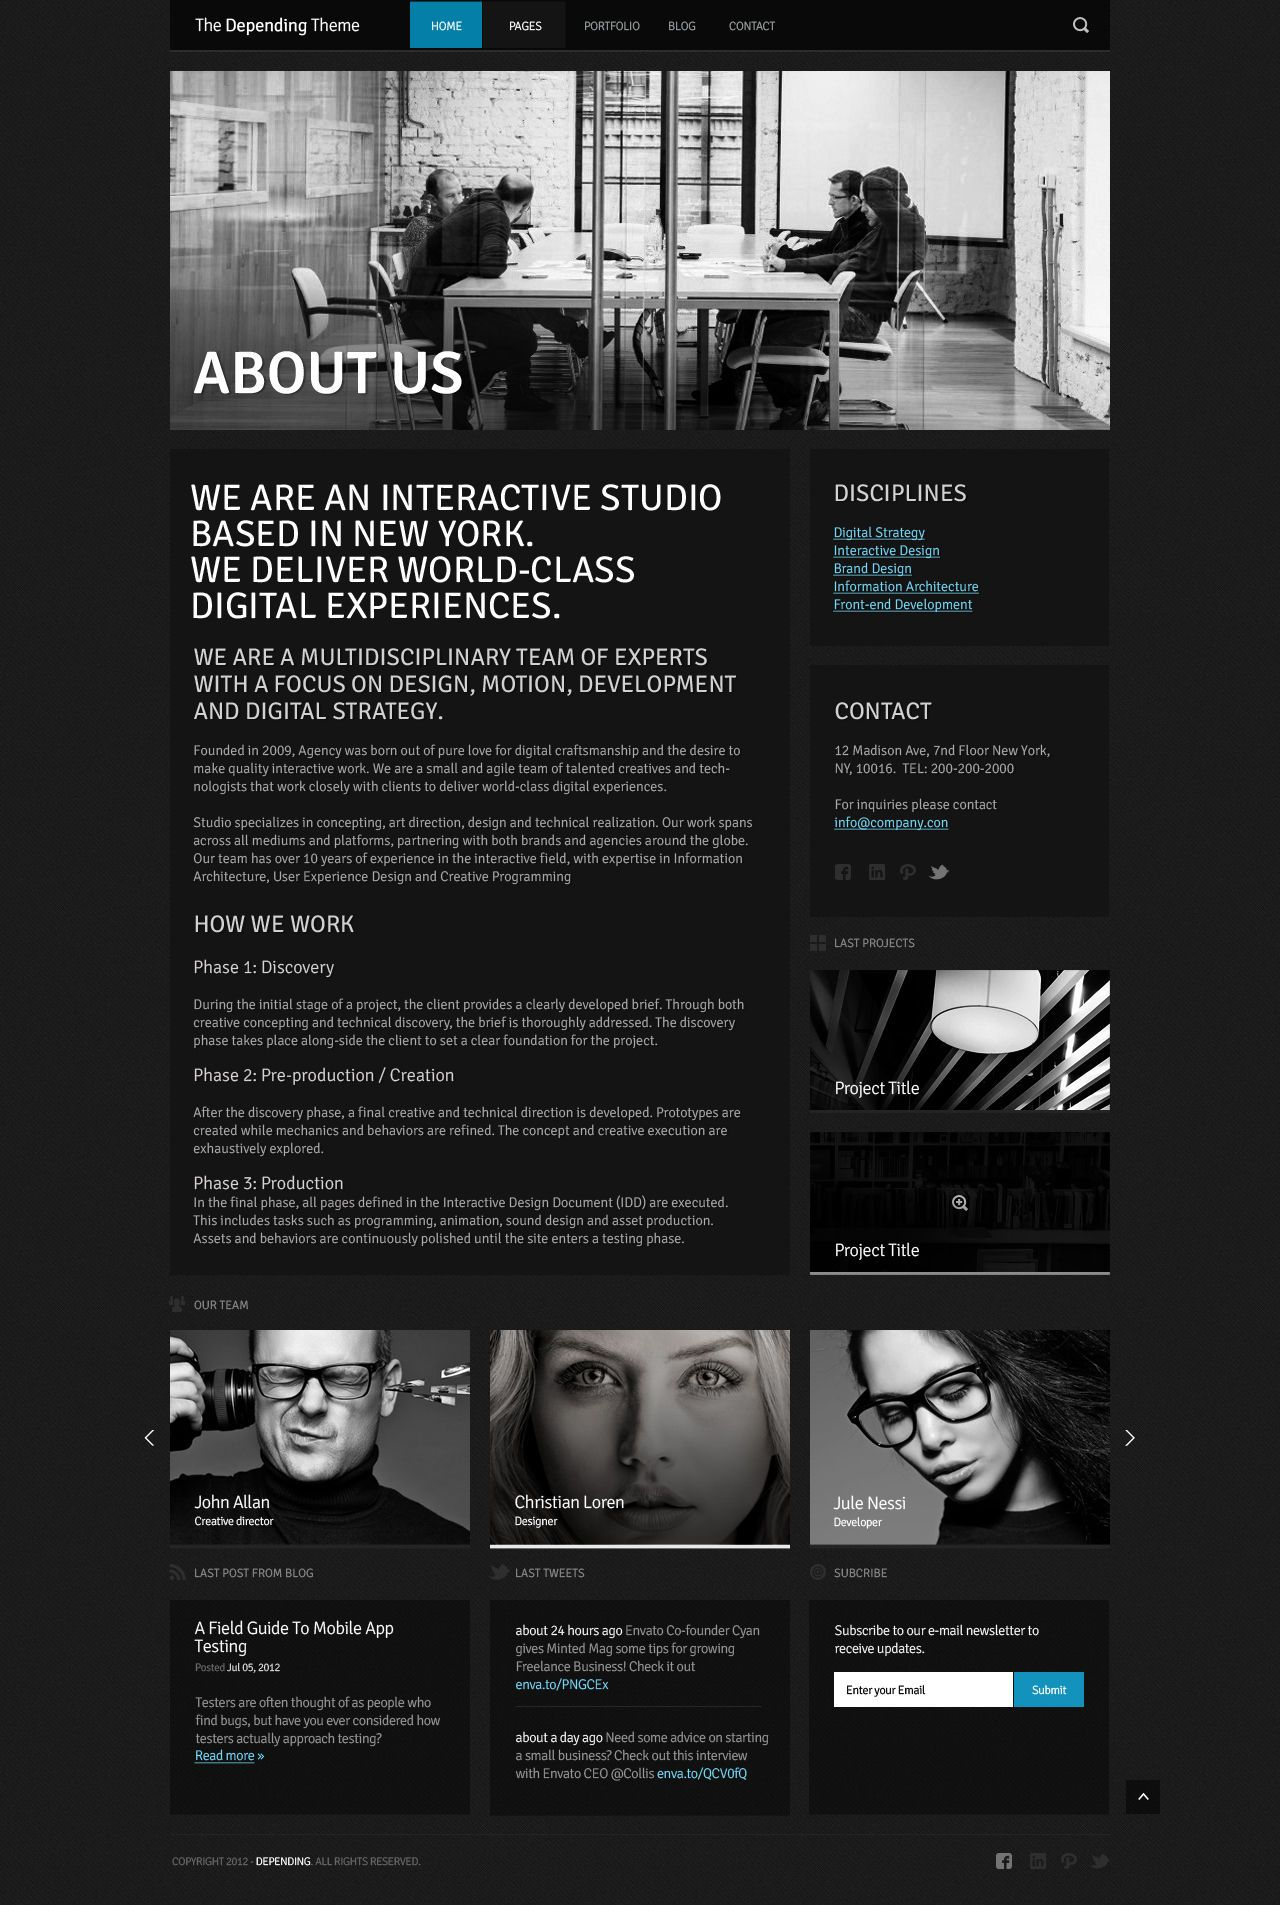 The Depending Theme Mojo Themes Design Webdesign Template Web Graphic Psd Photoshop Website Dark T Website Inspiration Web Design Digital Strategy